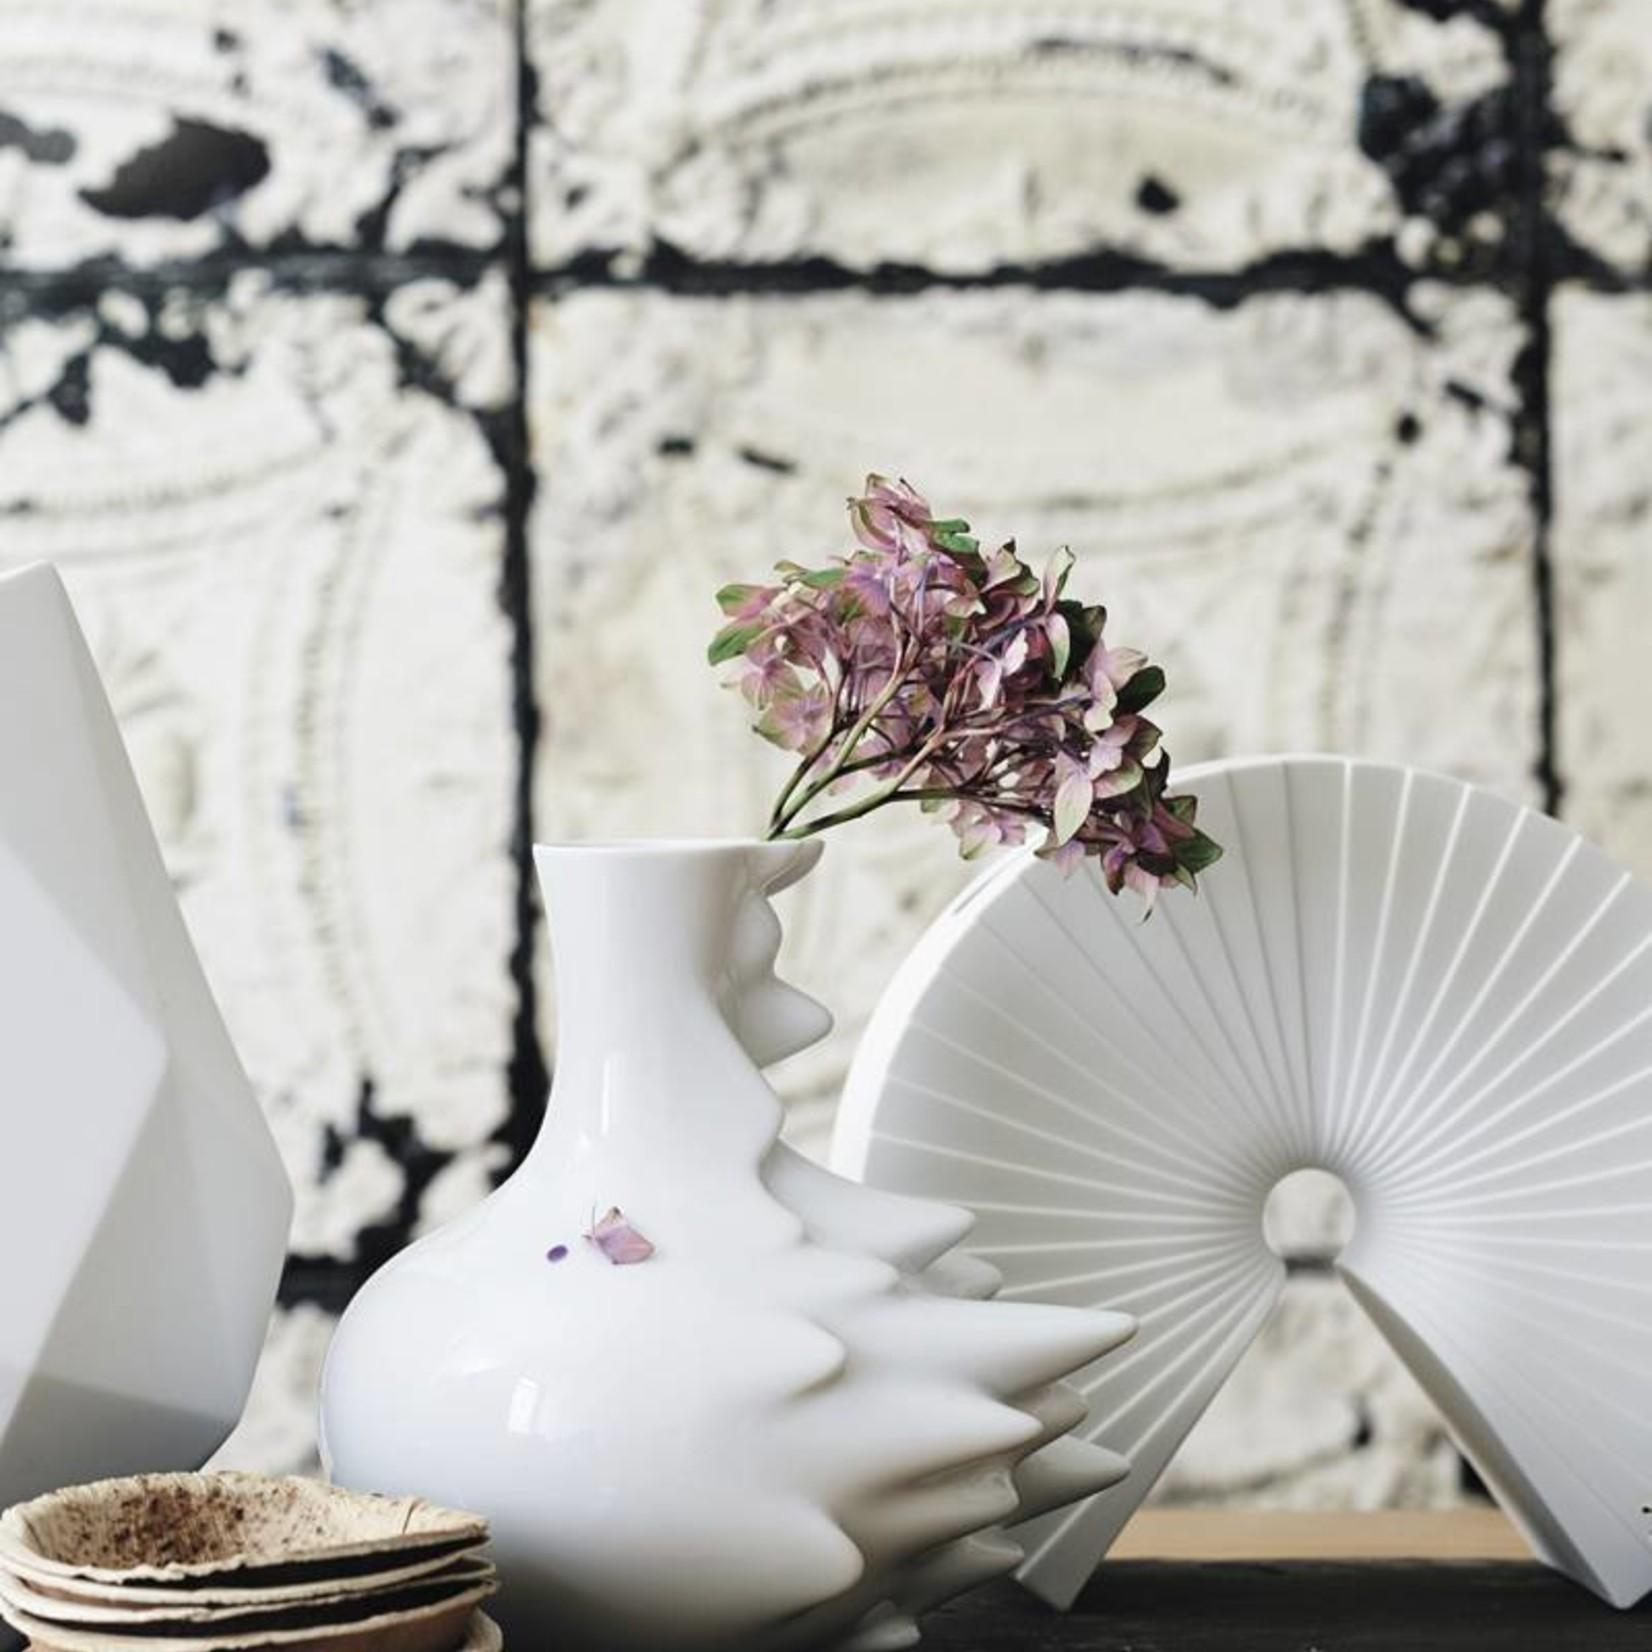 Rosenthal Porzellan Vase Fast, 13 cm I Rosenthal Porzellan I weiß glasiert - Copy